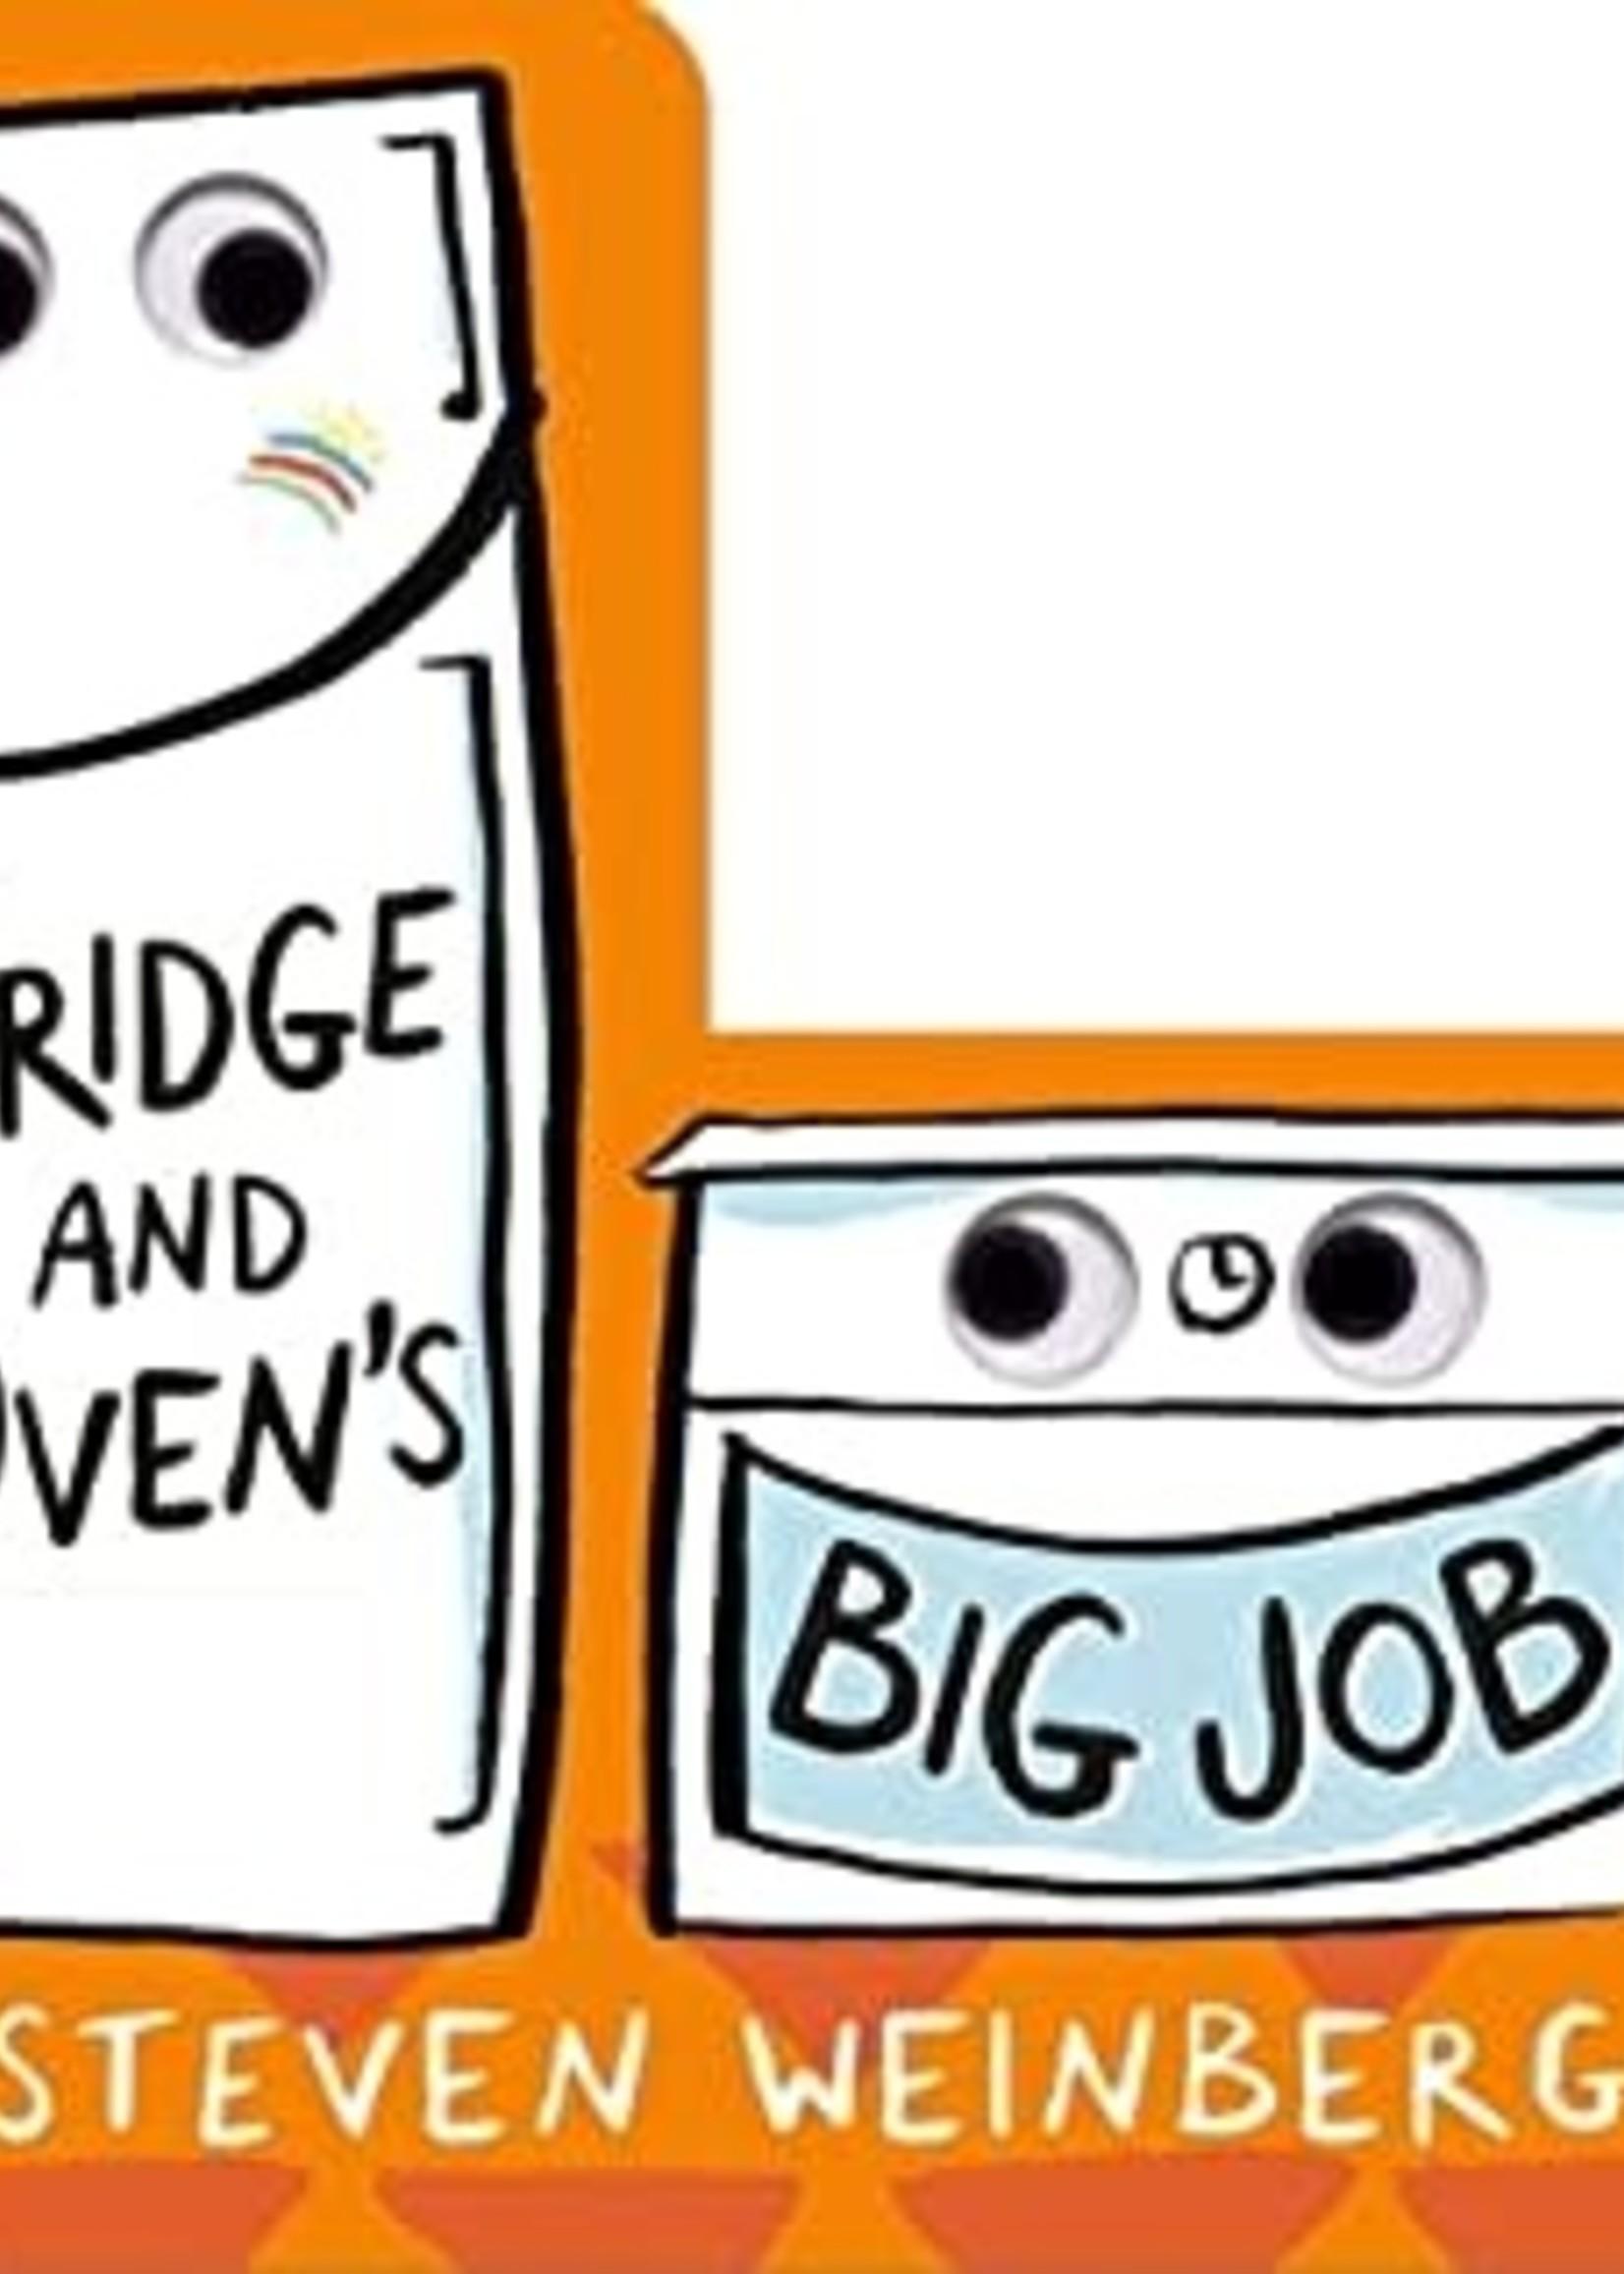 Fridge and Oven's Big Job by Steven Weinberg